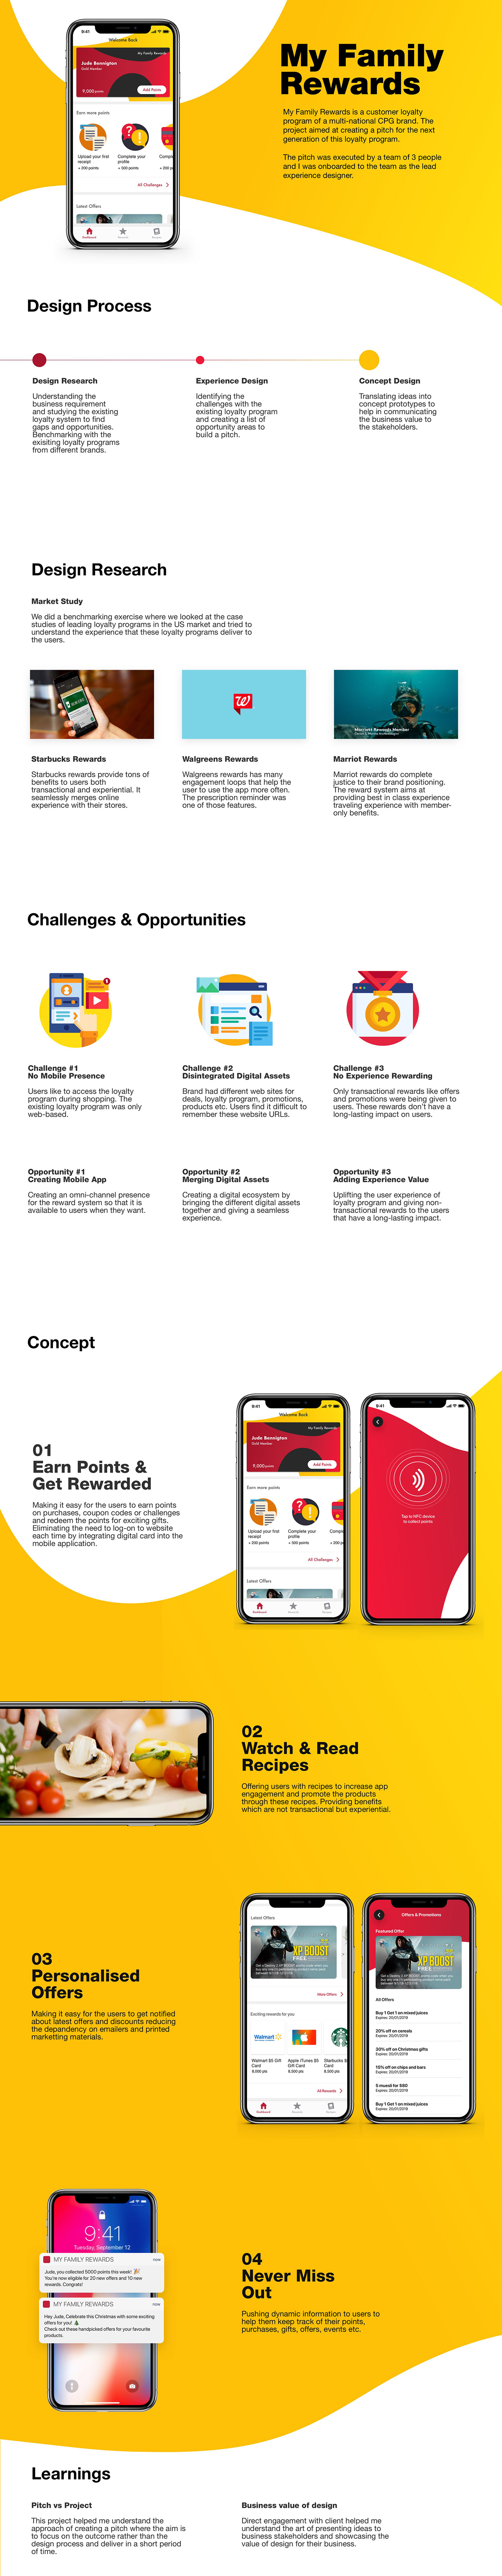 rewards loyalty UI/UX concept pitch visual design cpg FMCG Us